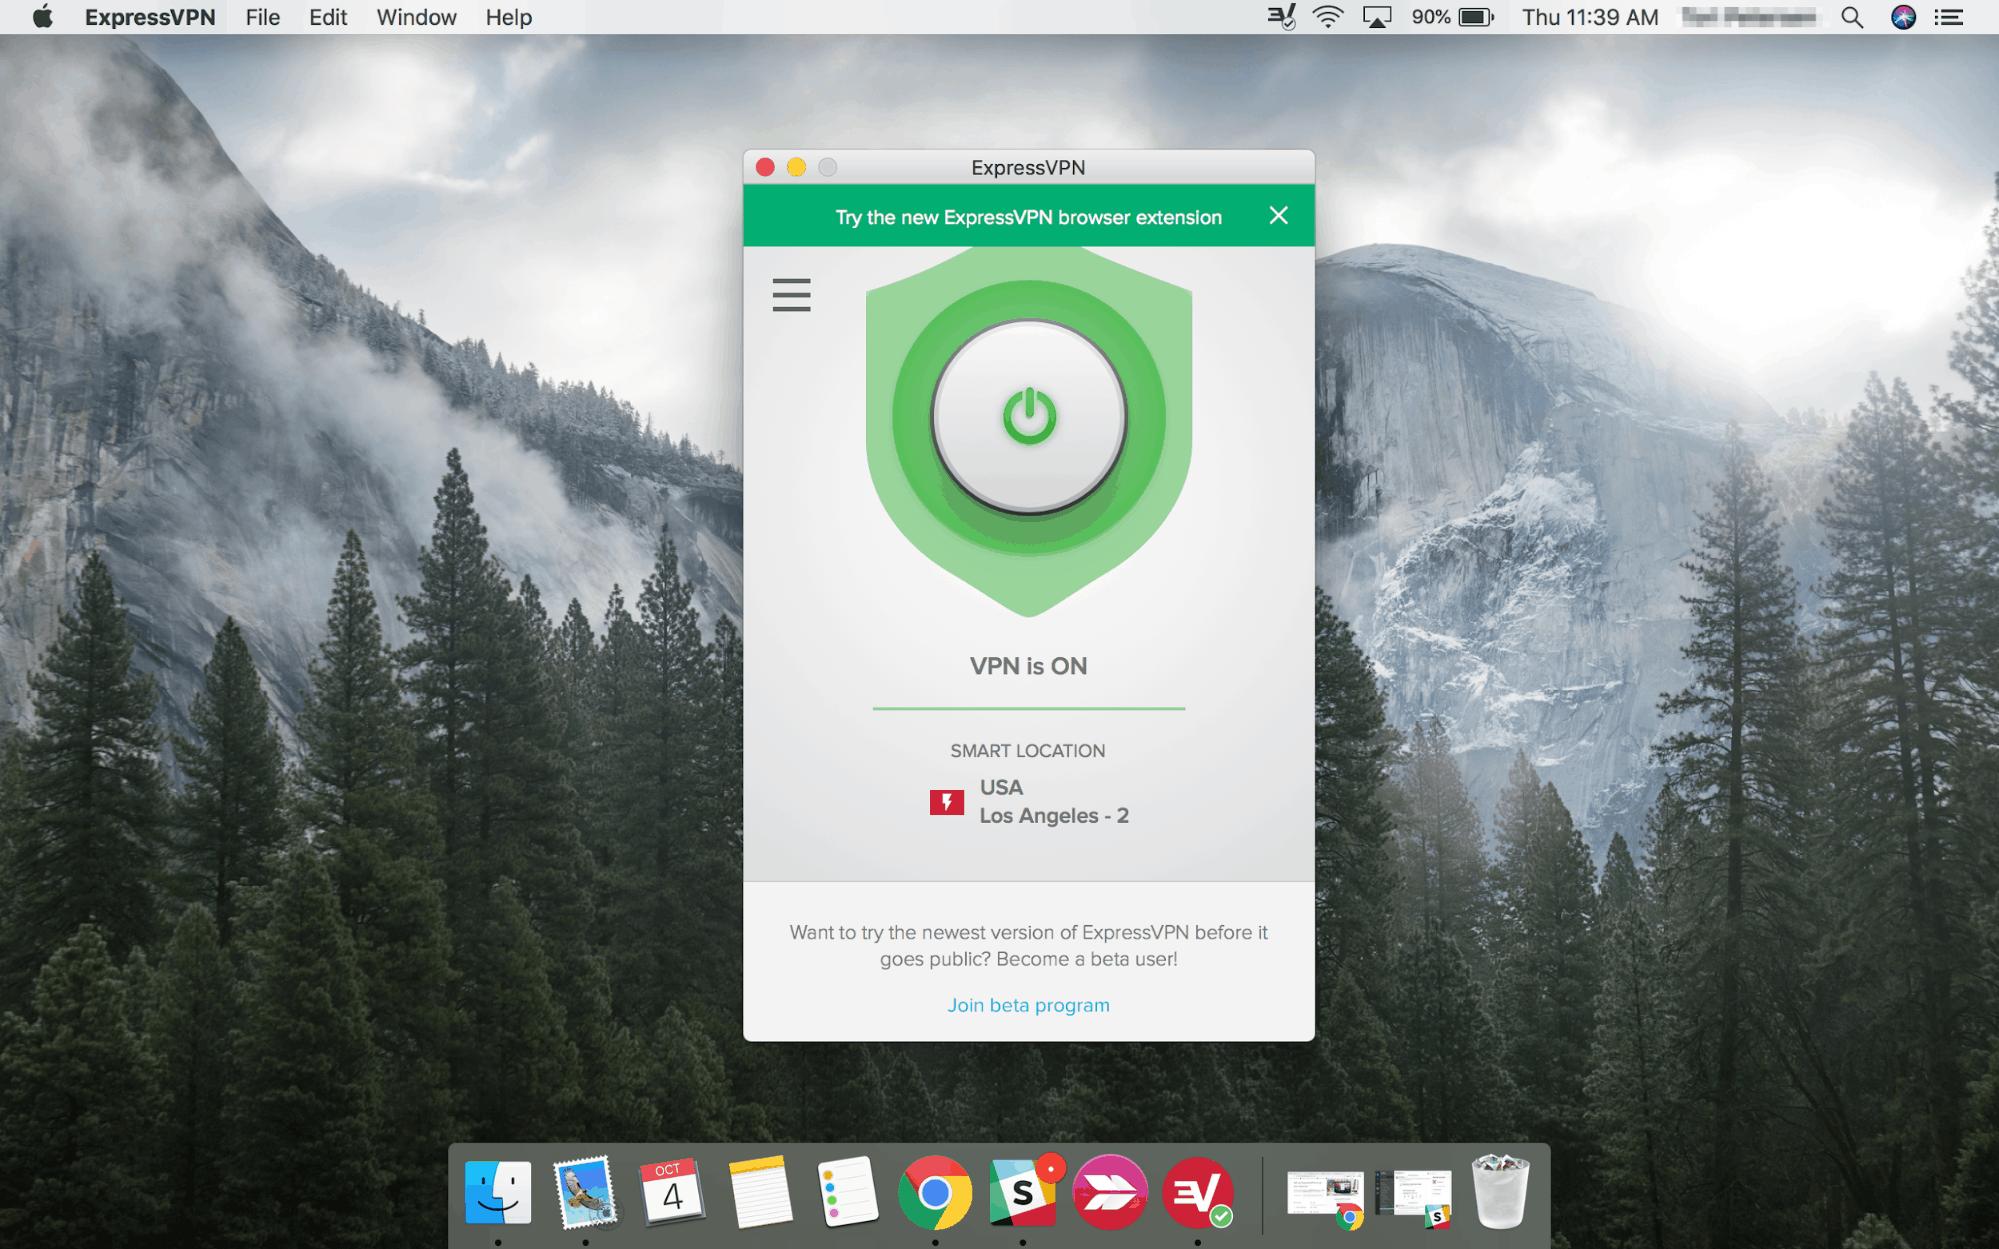 ExpressVPN Mac app VPN is On screen